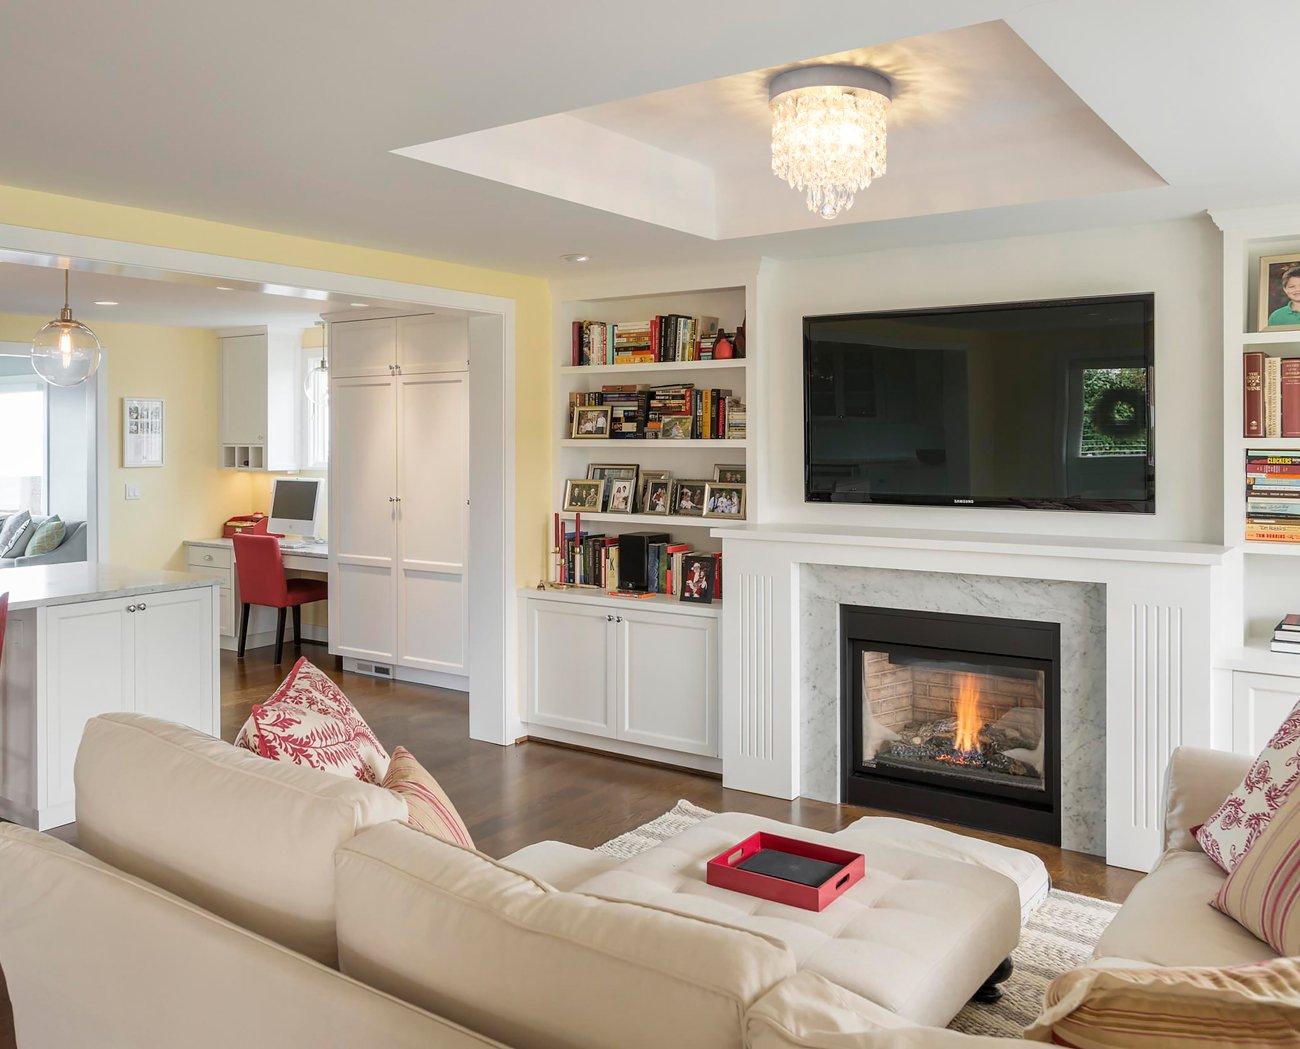 SHINE HAI Crystal Chandelier, 3-light Modern Flush Mount Ceiling Pendant Light H9.45'' X W8.66'' for Bedroom, Living Room, Dining Room, Kitchen, Hallway by SHINE HAI (Image #7)